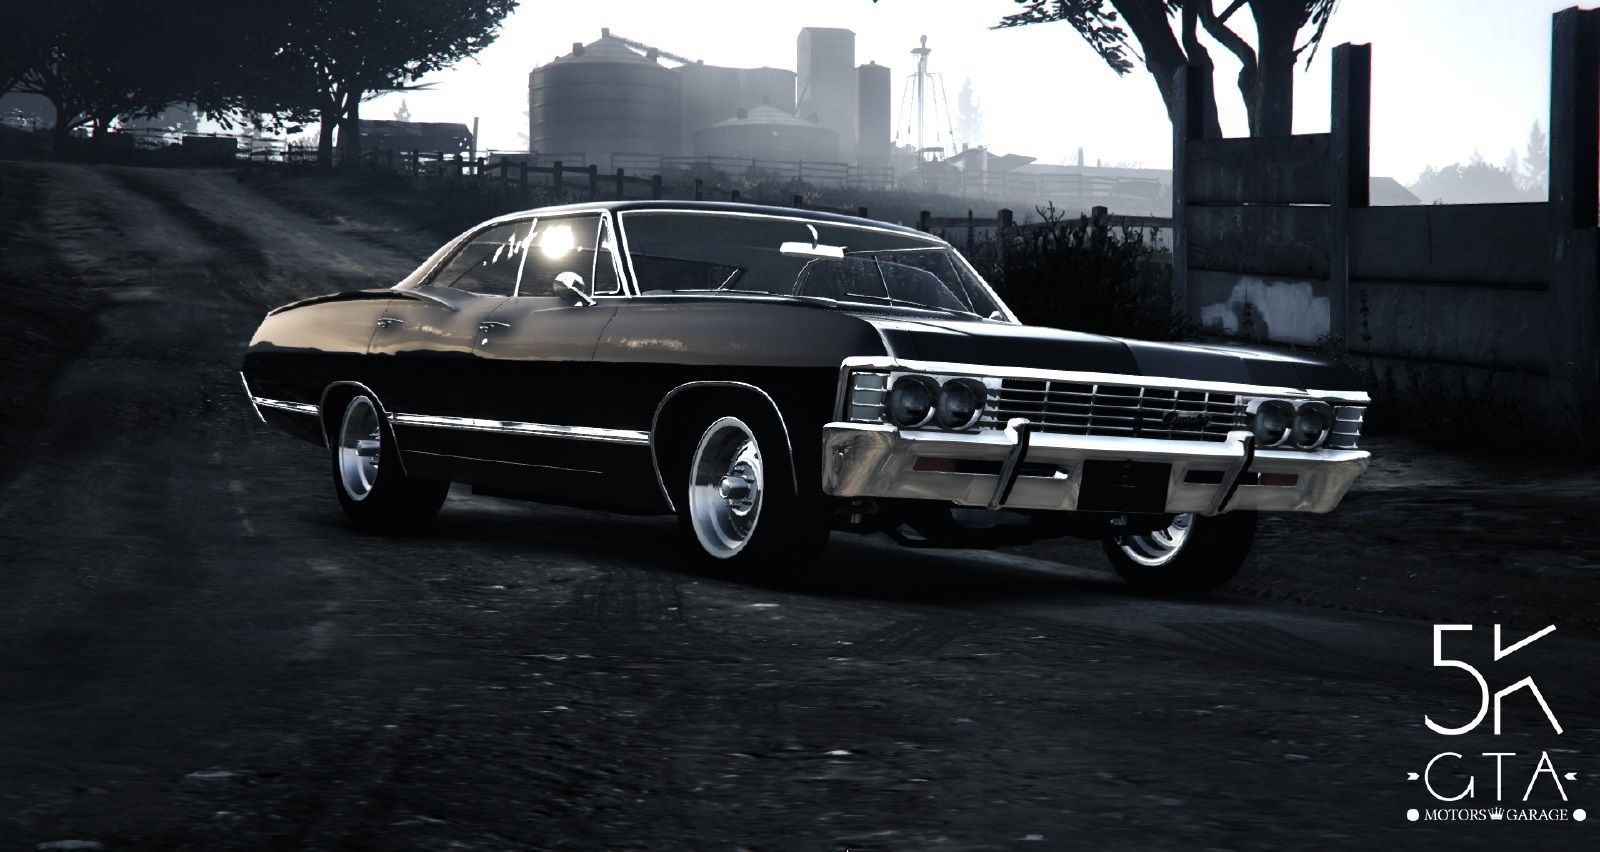 【gta5 Pc版】実車mod「シボレー・インパラ 1967年式」登場!【スーパーナチュラル仕様】 グランド